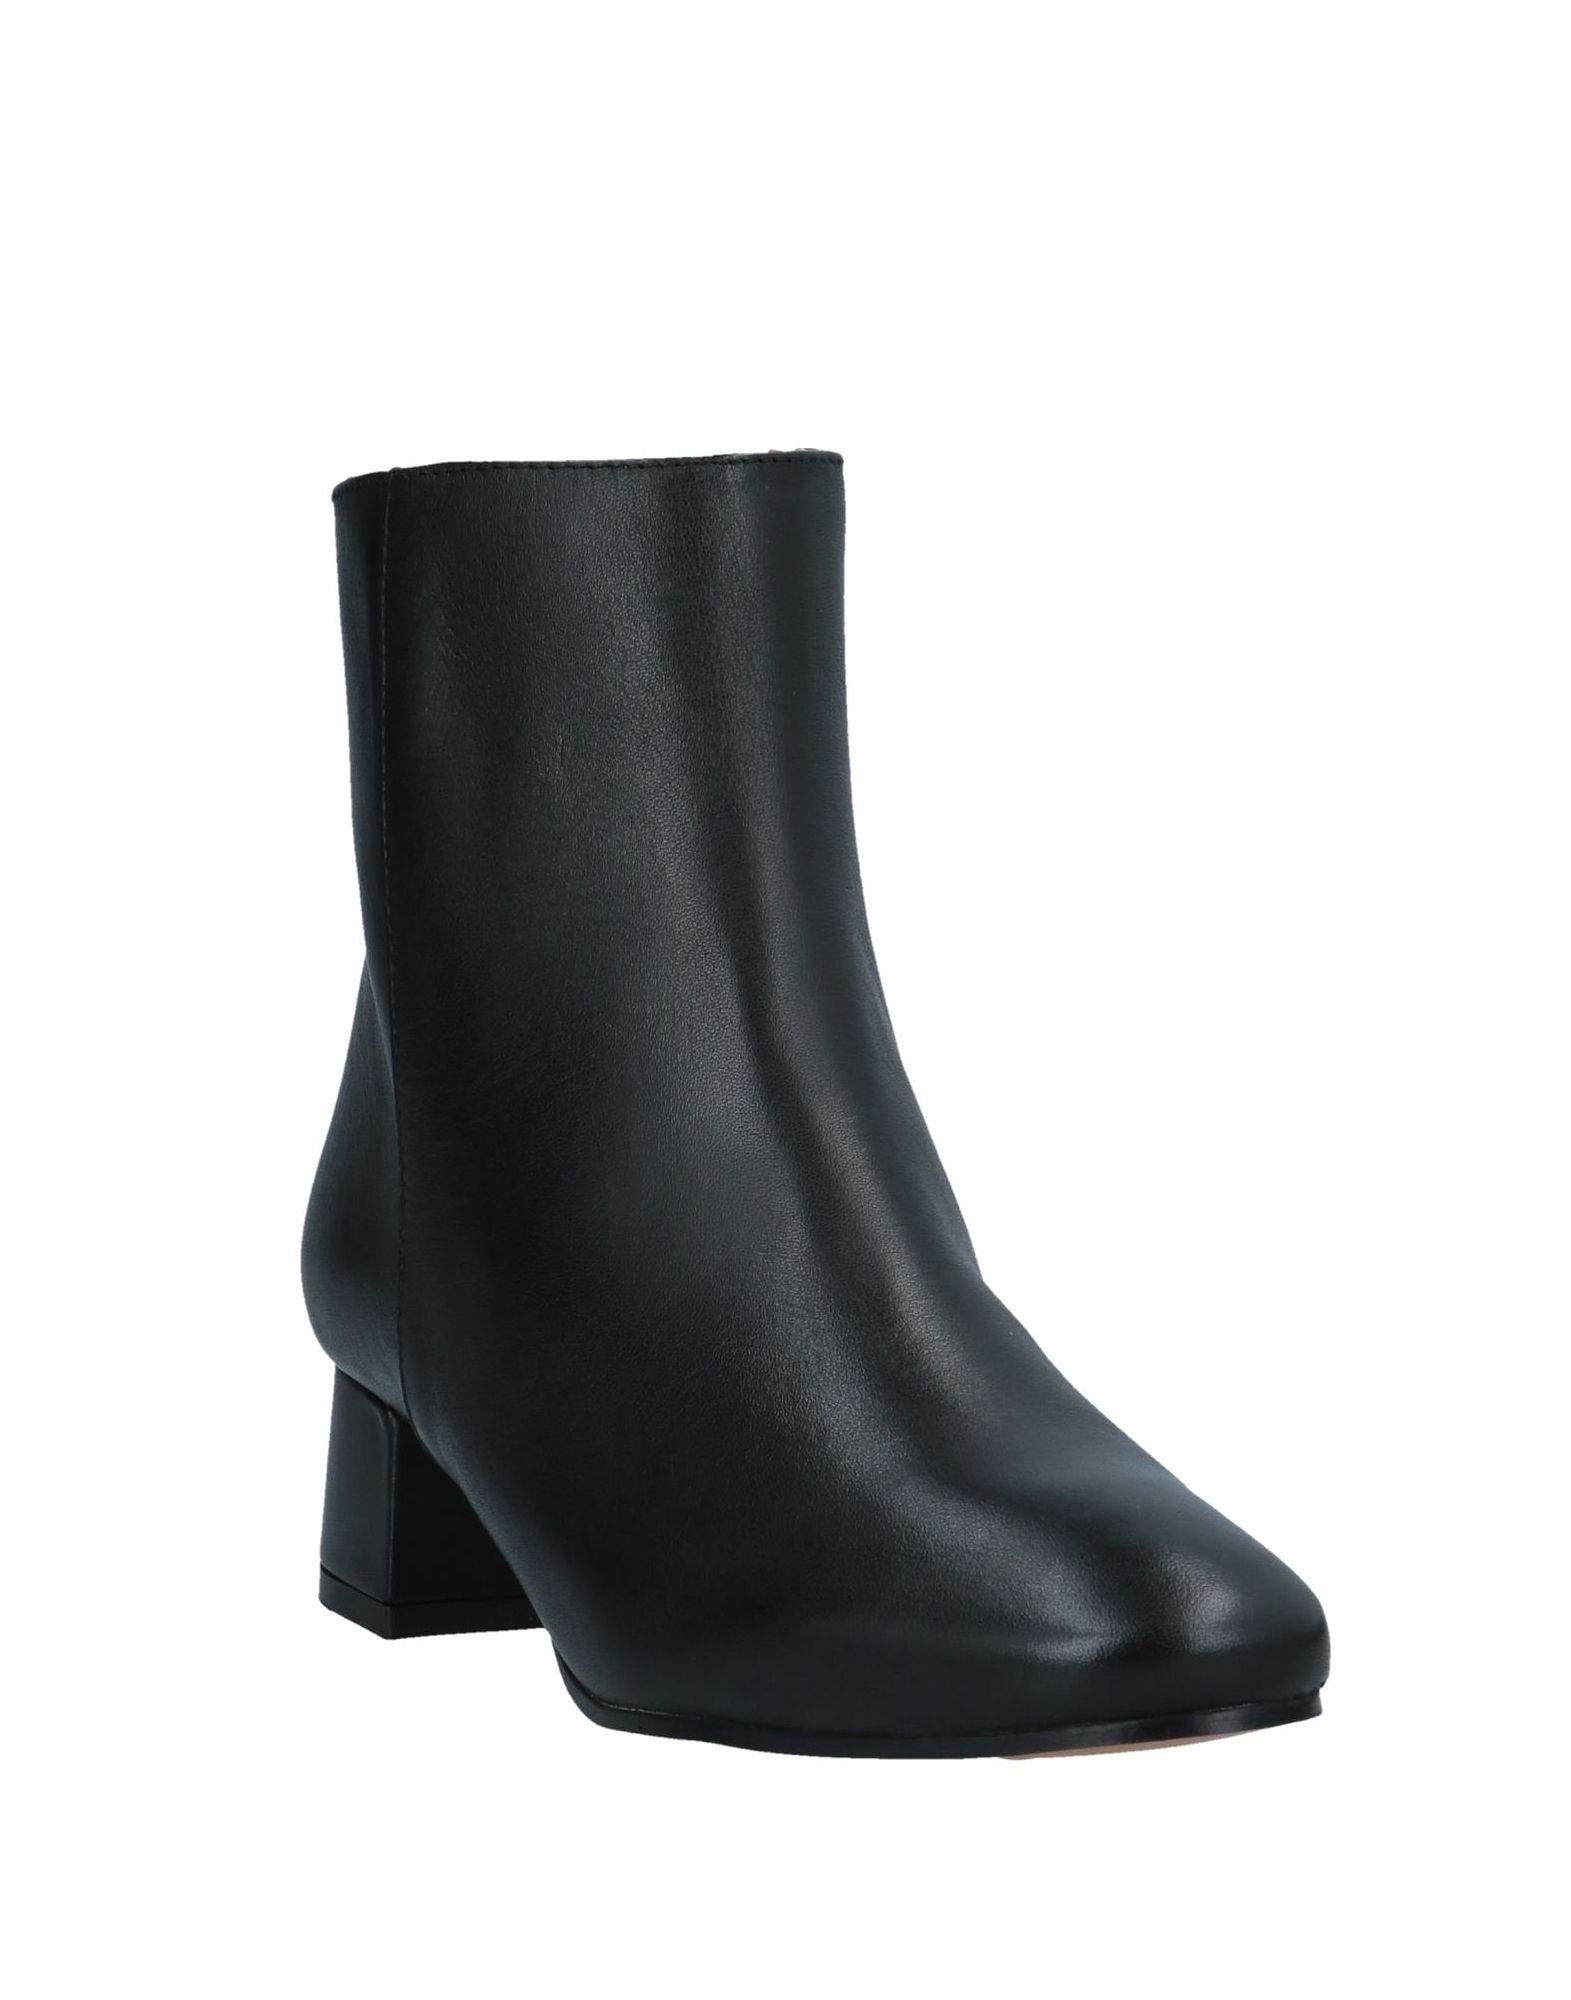 Stilvolle billige  Schuhe Apologie Stiefelette Damen  billige 11548406IS cb5e6f